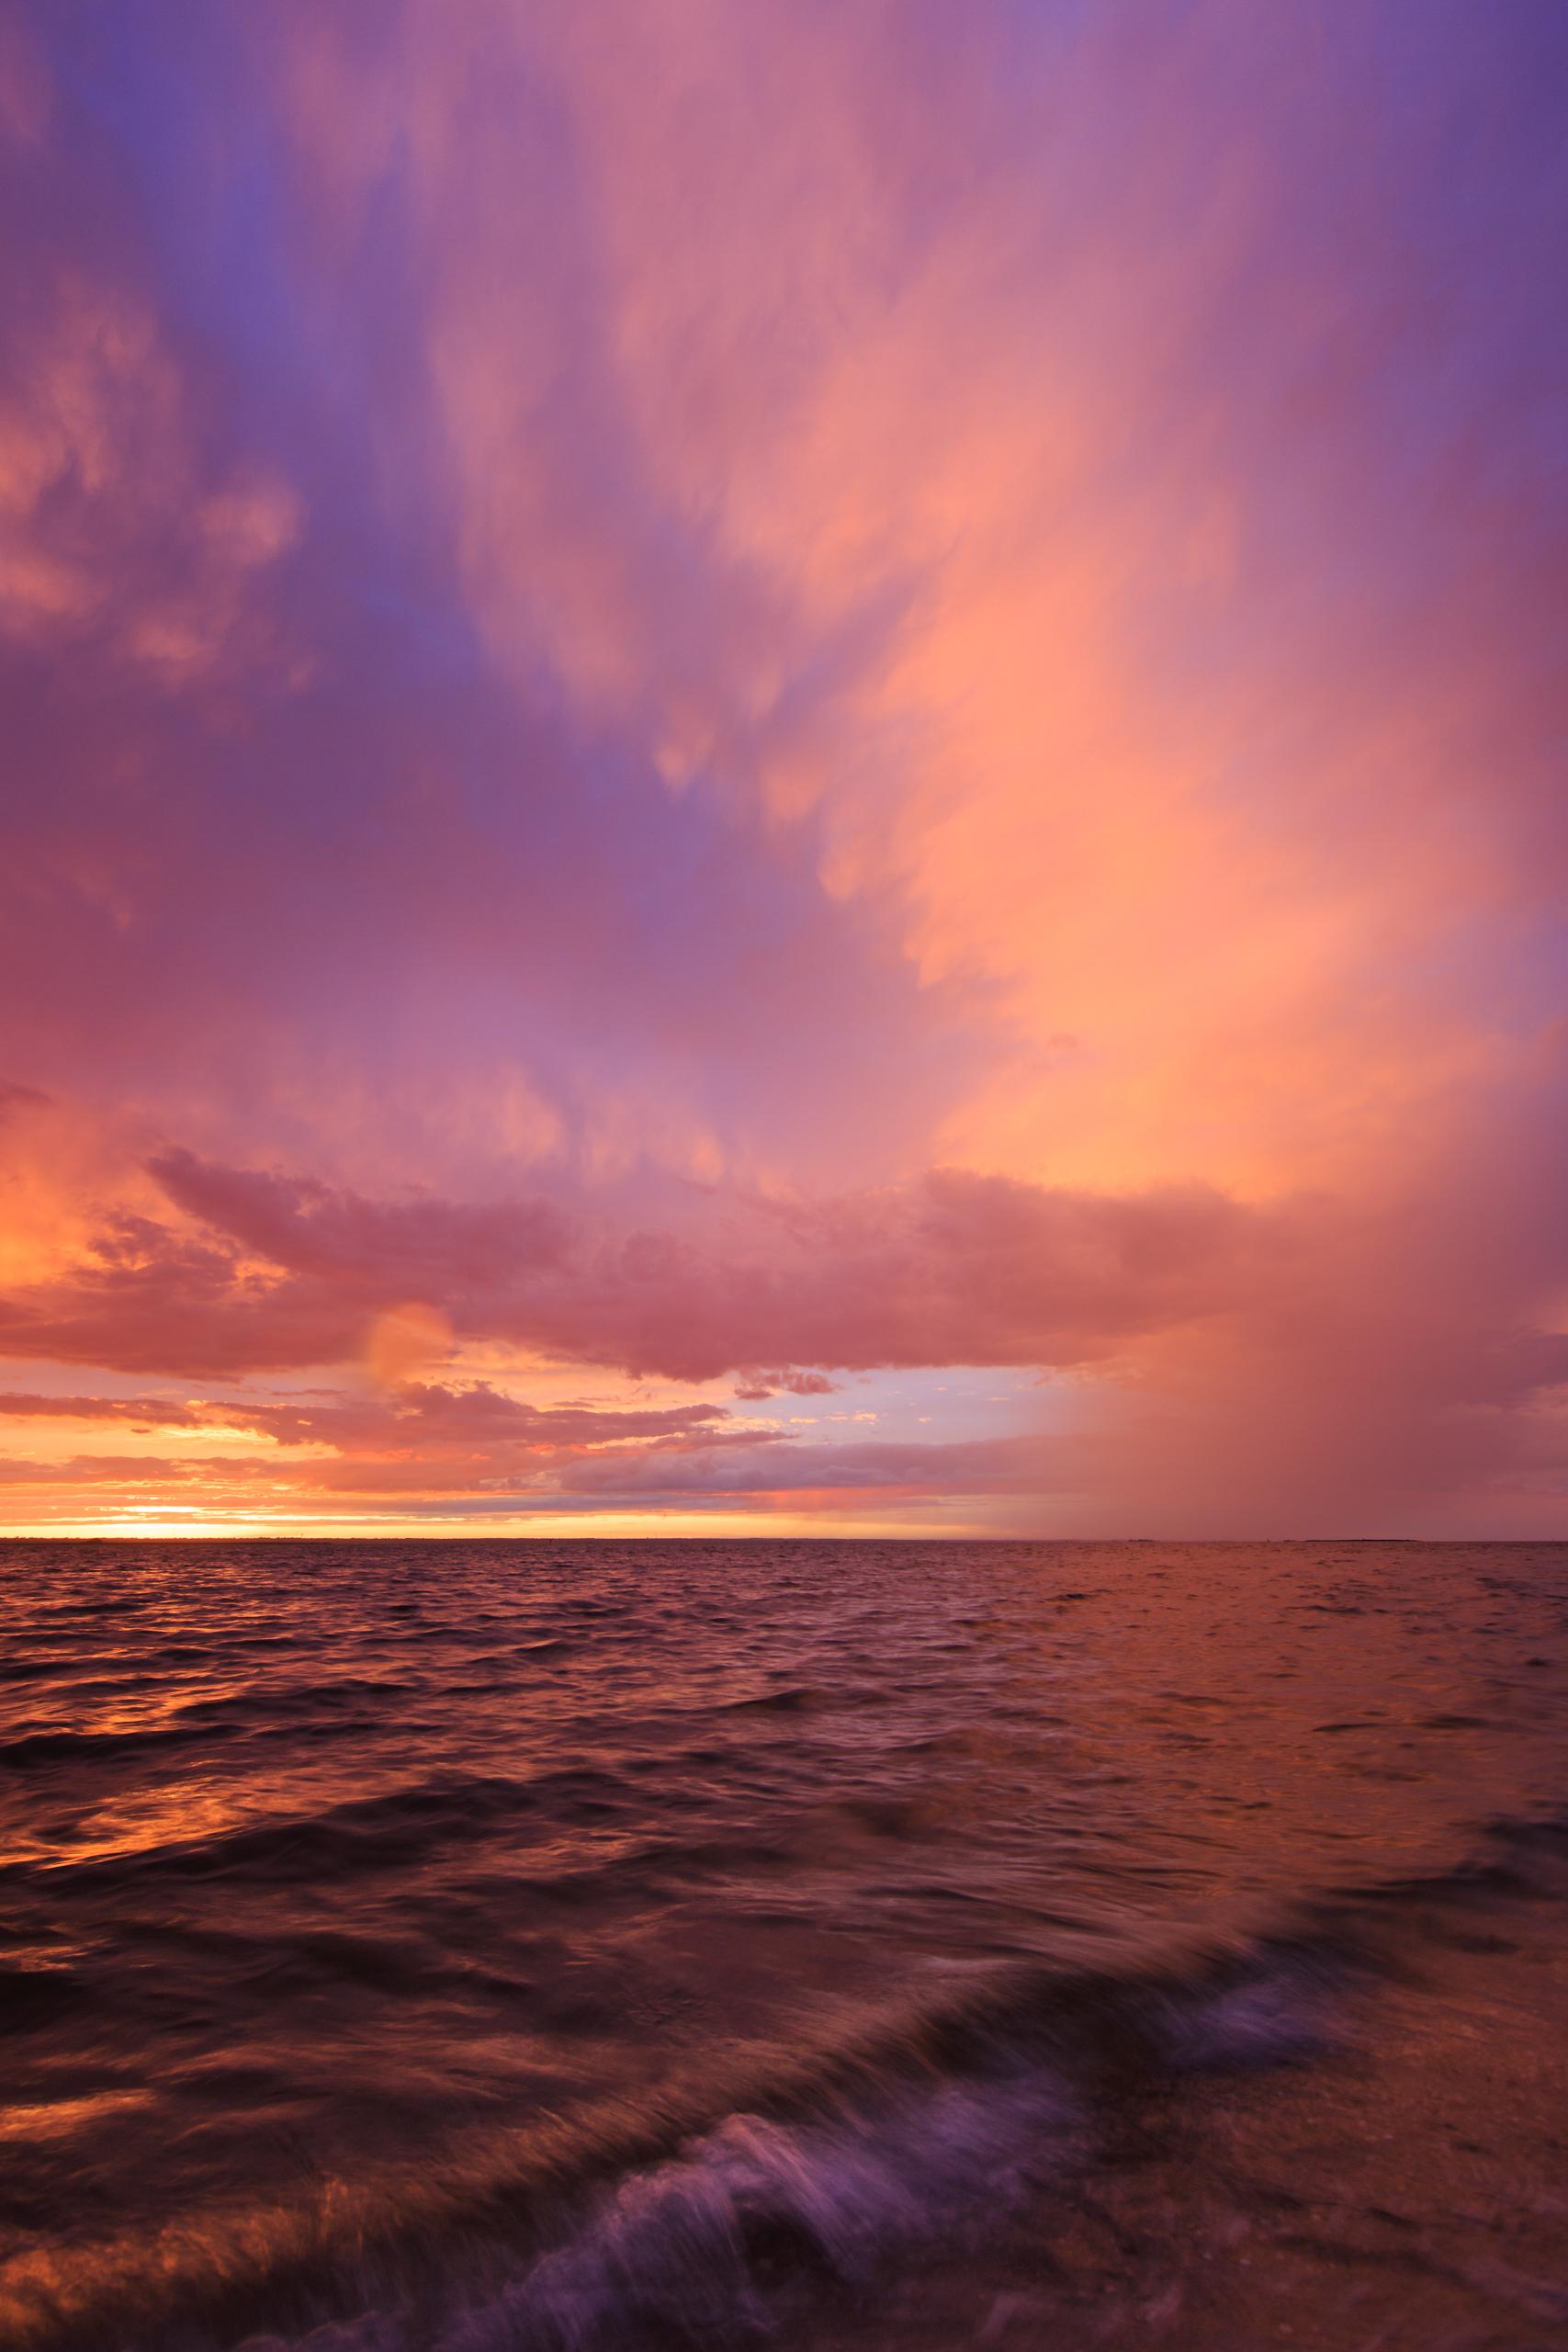 Seascape Photography - Toby Harriman